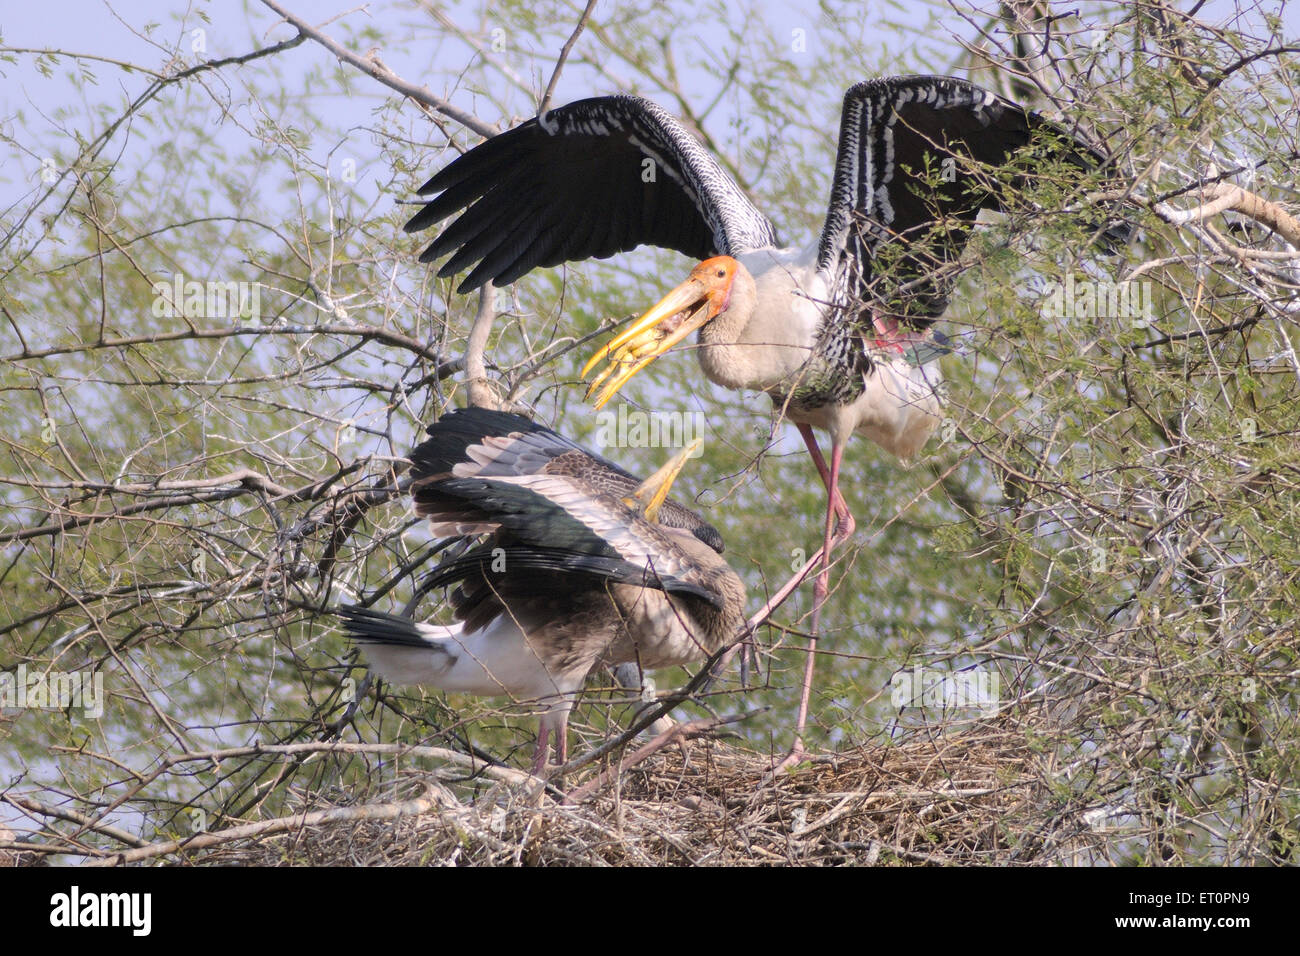 Vögel; bemalte Storch Mycteria Leucocephala Fütterung Küken; Bharatpur; Rajasthan; Indien Stockbild